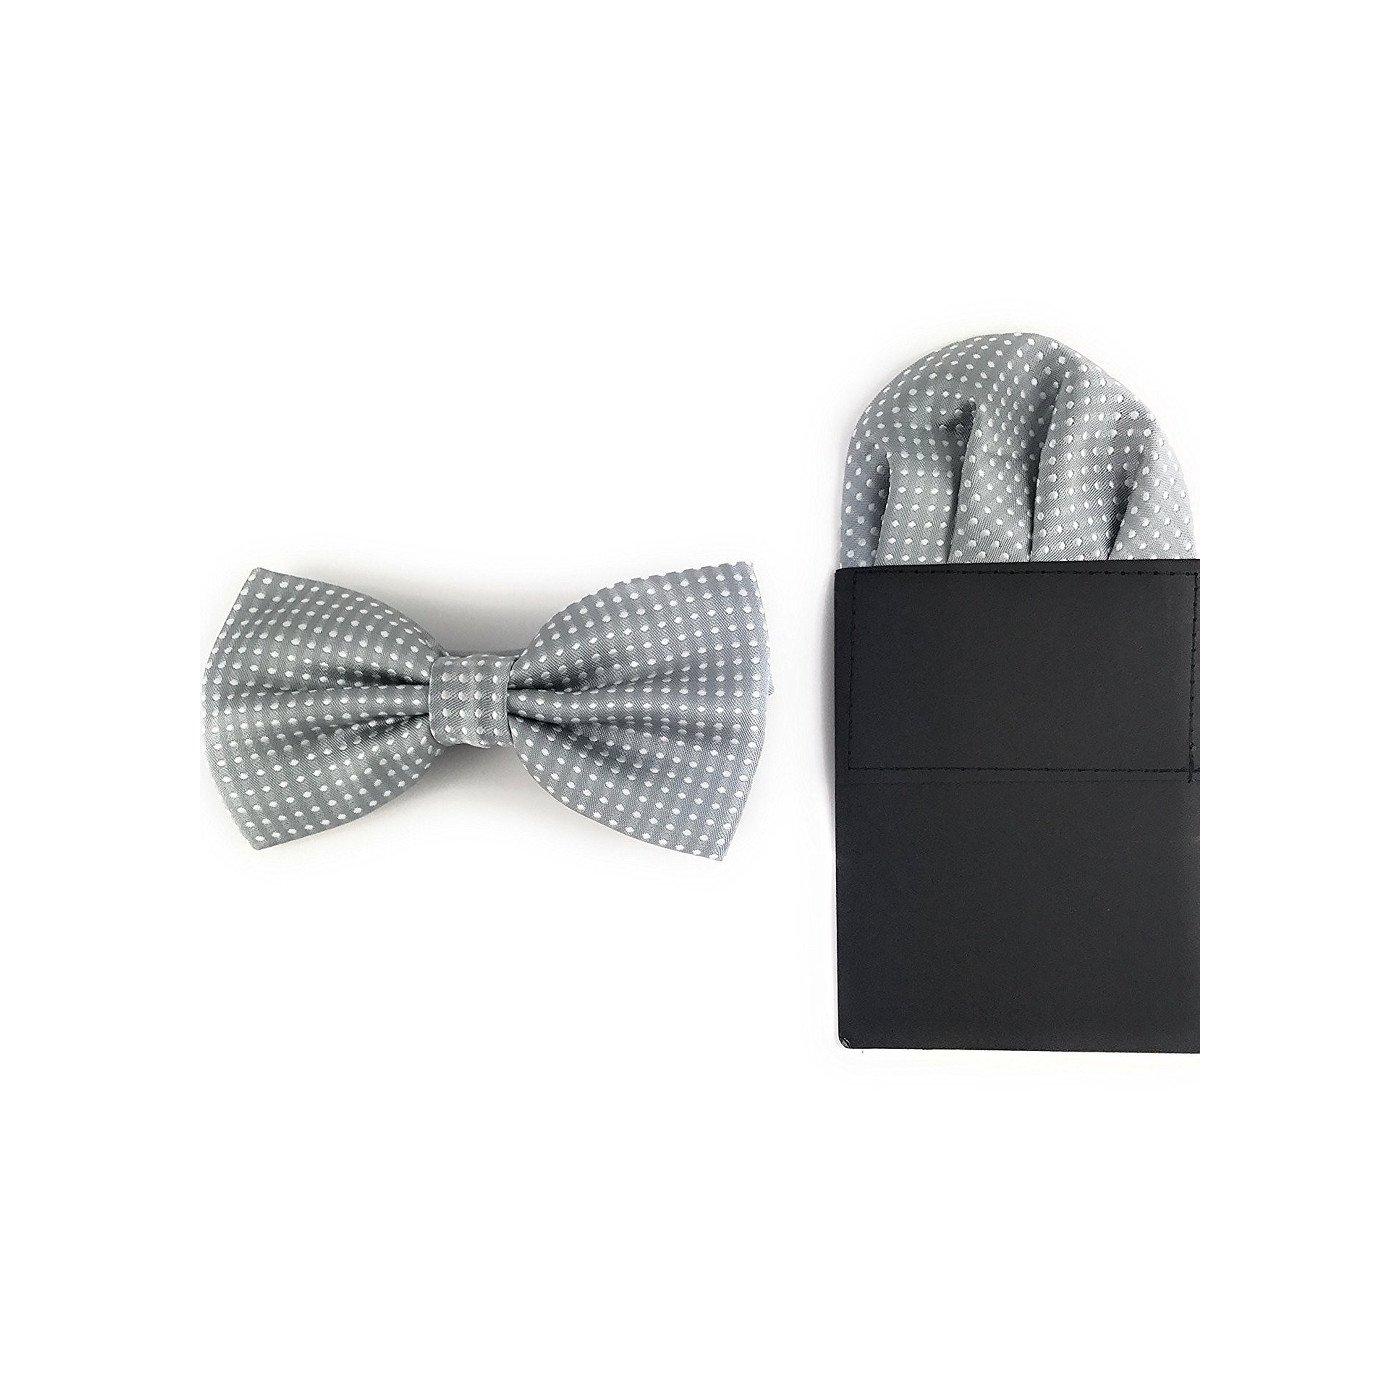 Label-Cravate - Pajarita - para hombre Gris gris perla Talla única ...